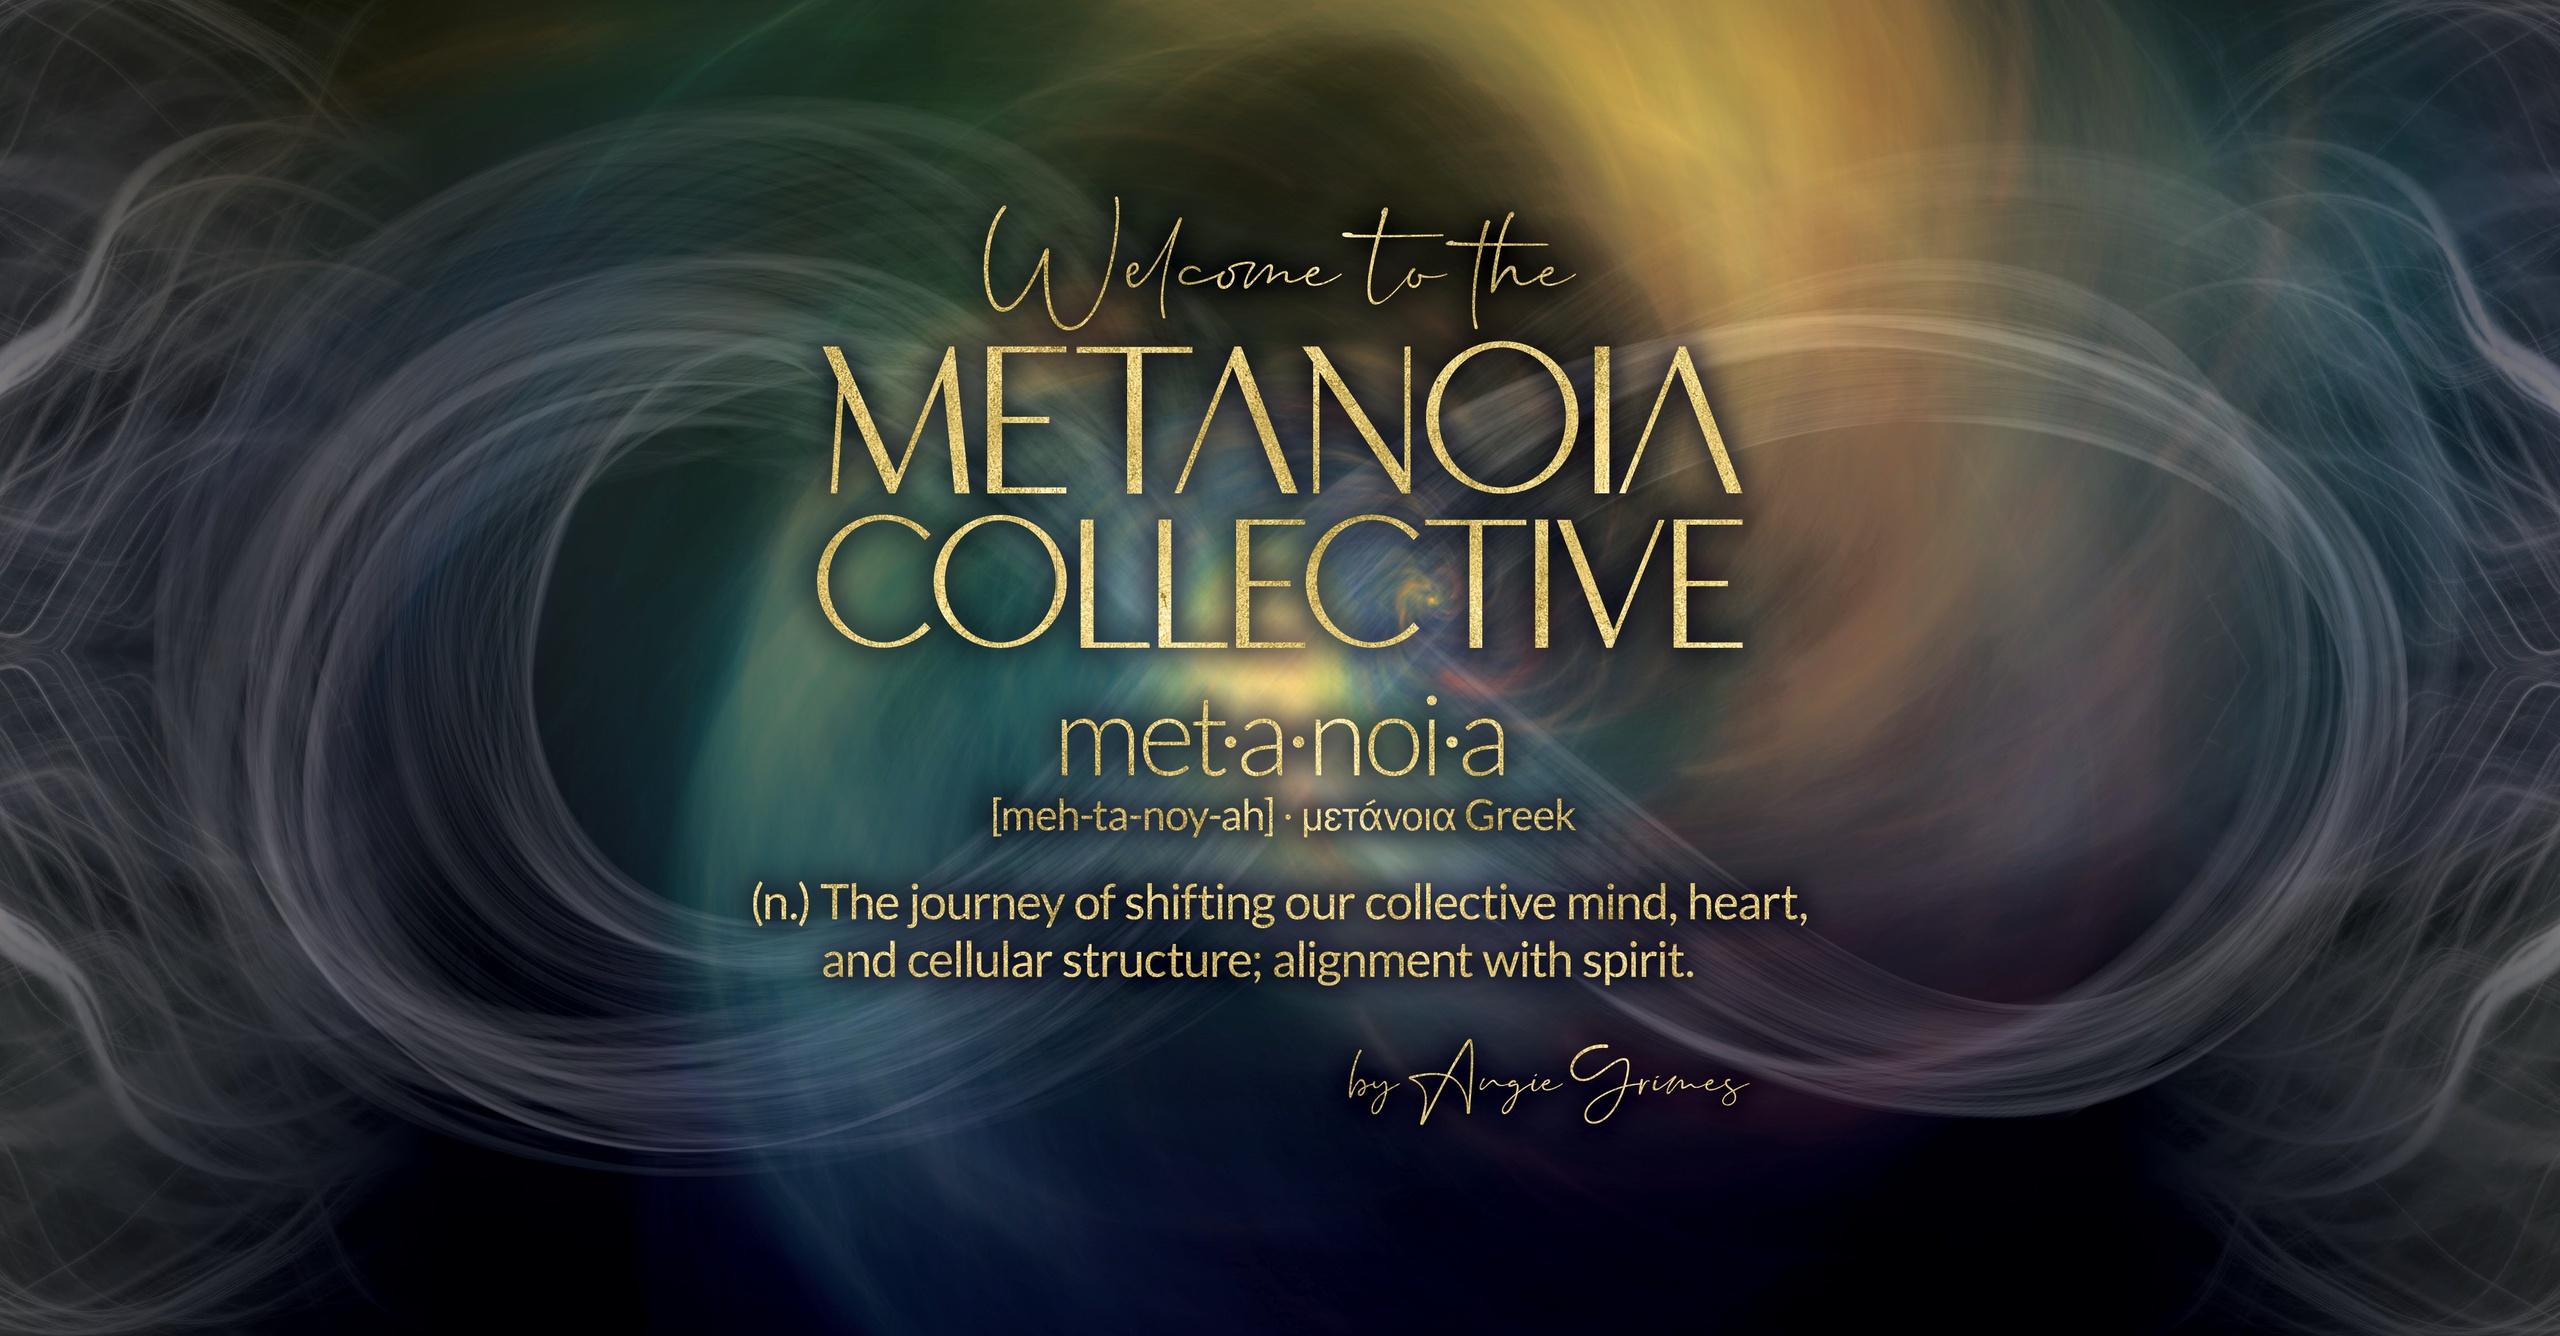 Metanoia Collective